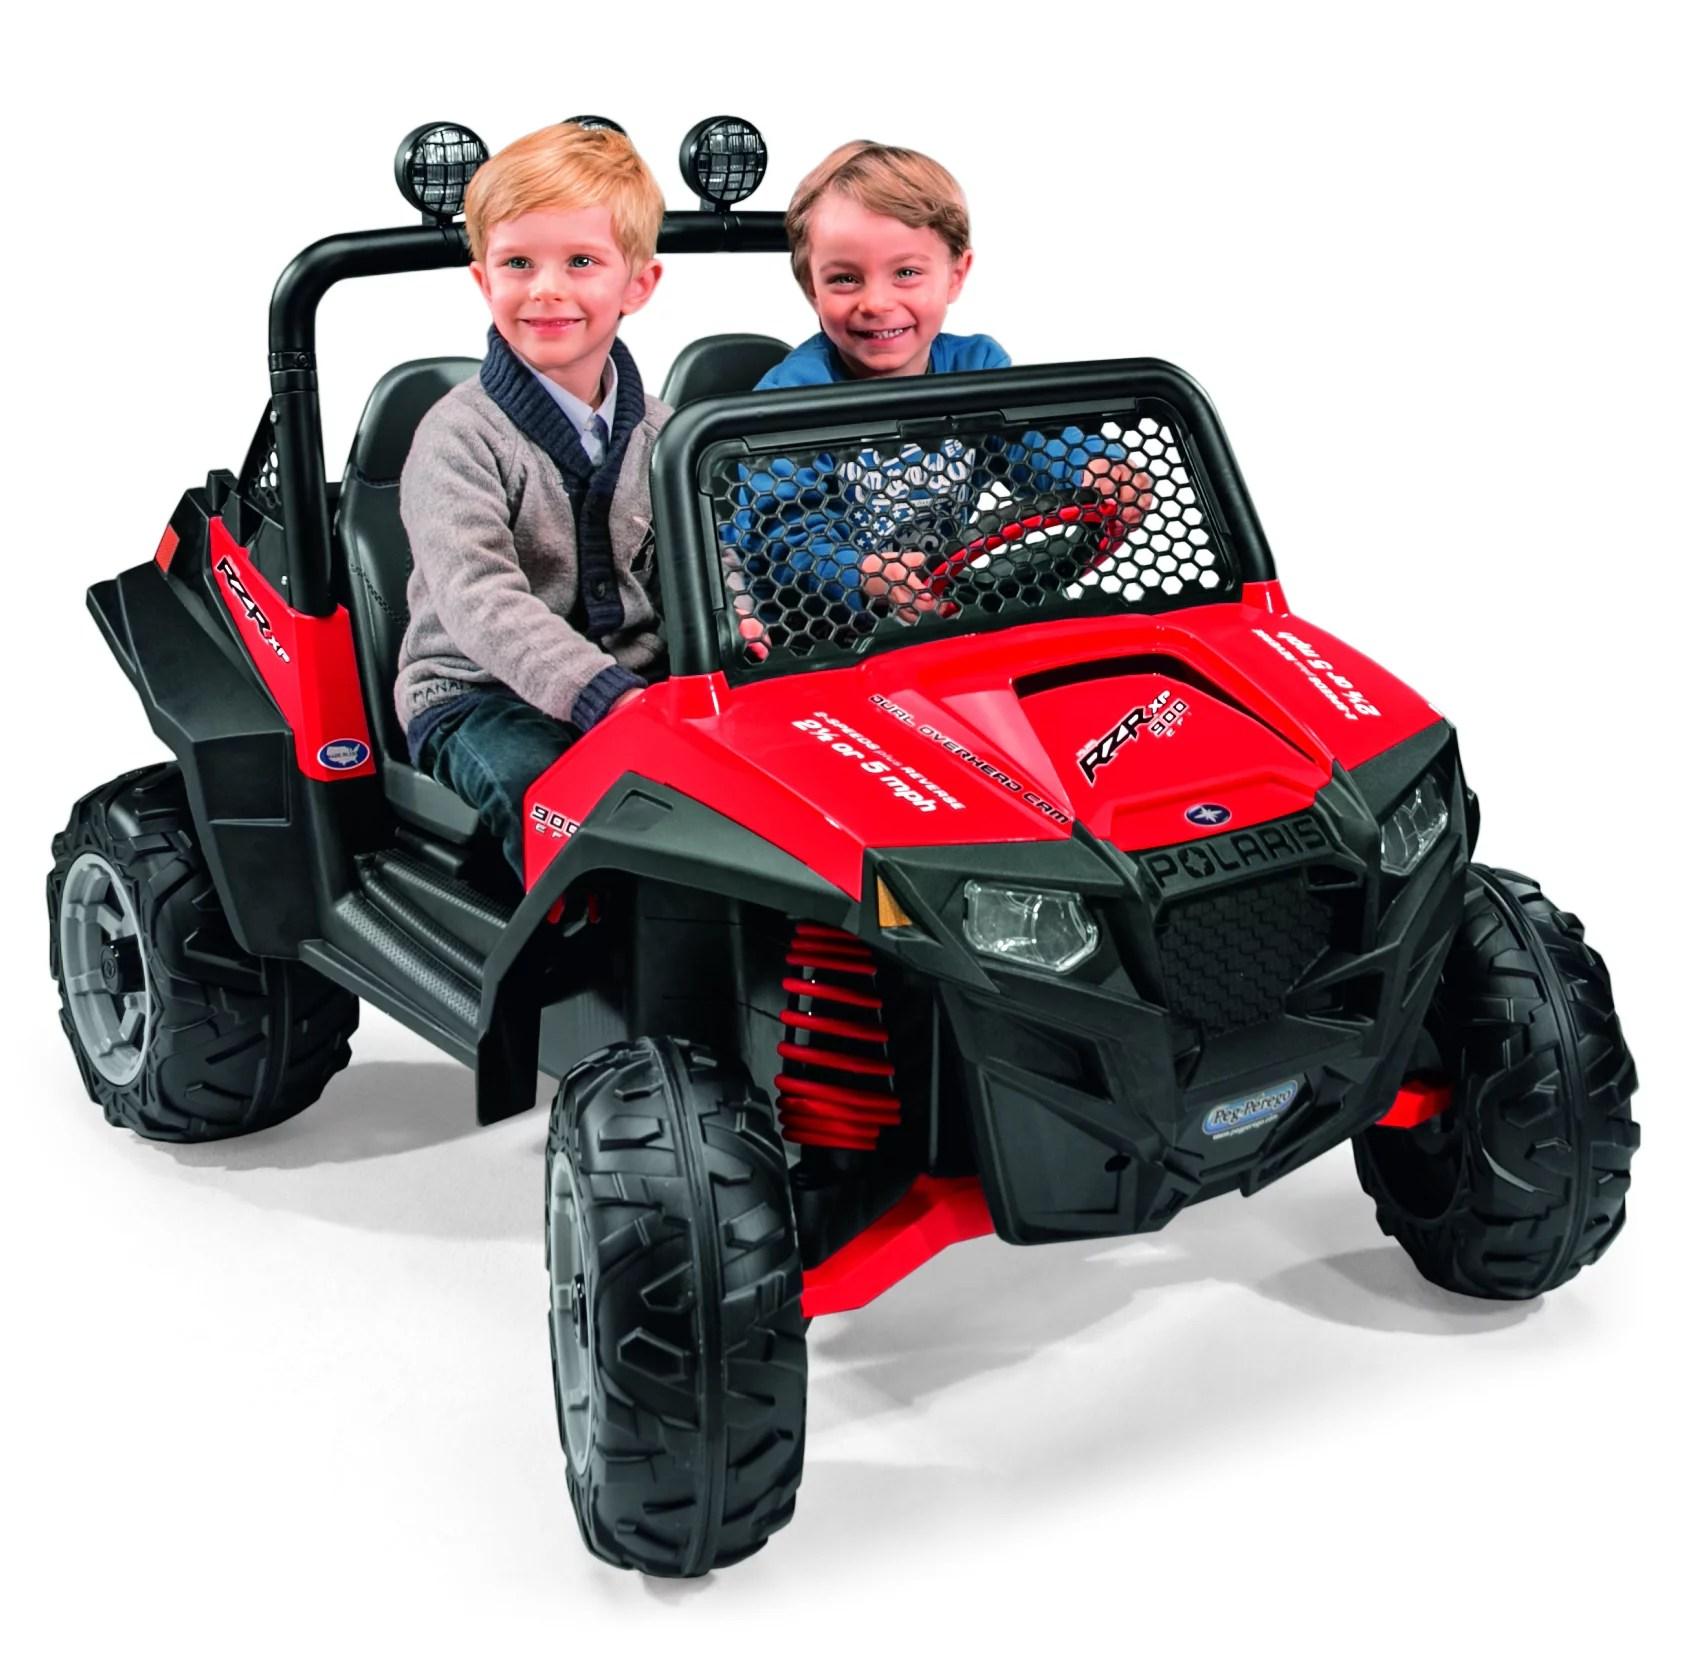 hight resolution of peg perego polaris ranger rzr 900 12 volt battery powered ride on red walmart com